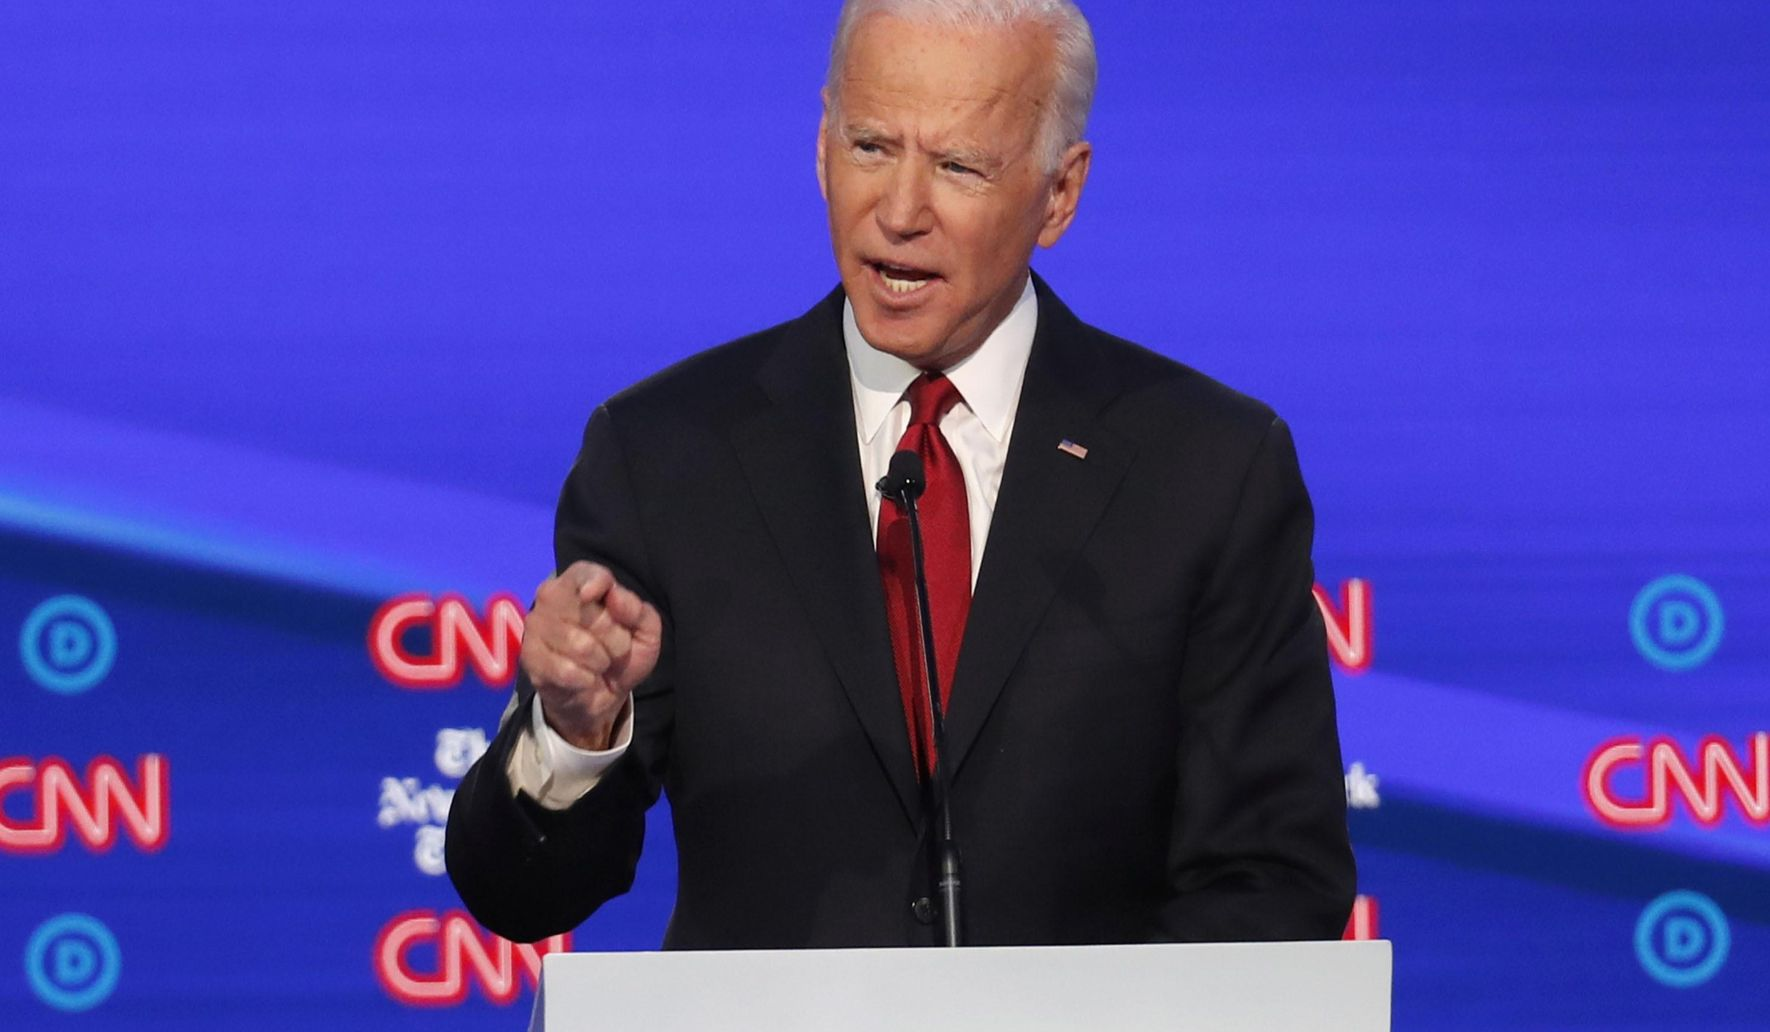 Joe Biden dismisses Supreme Court packing at debate